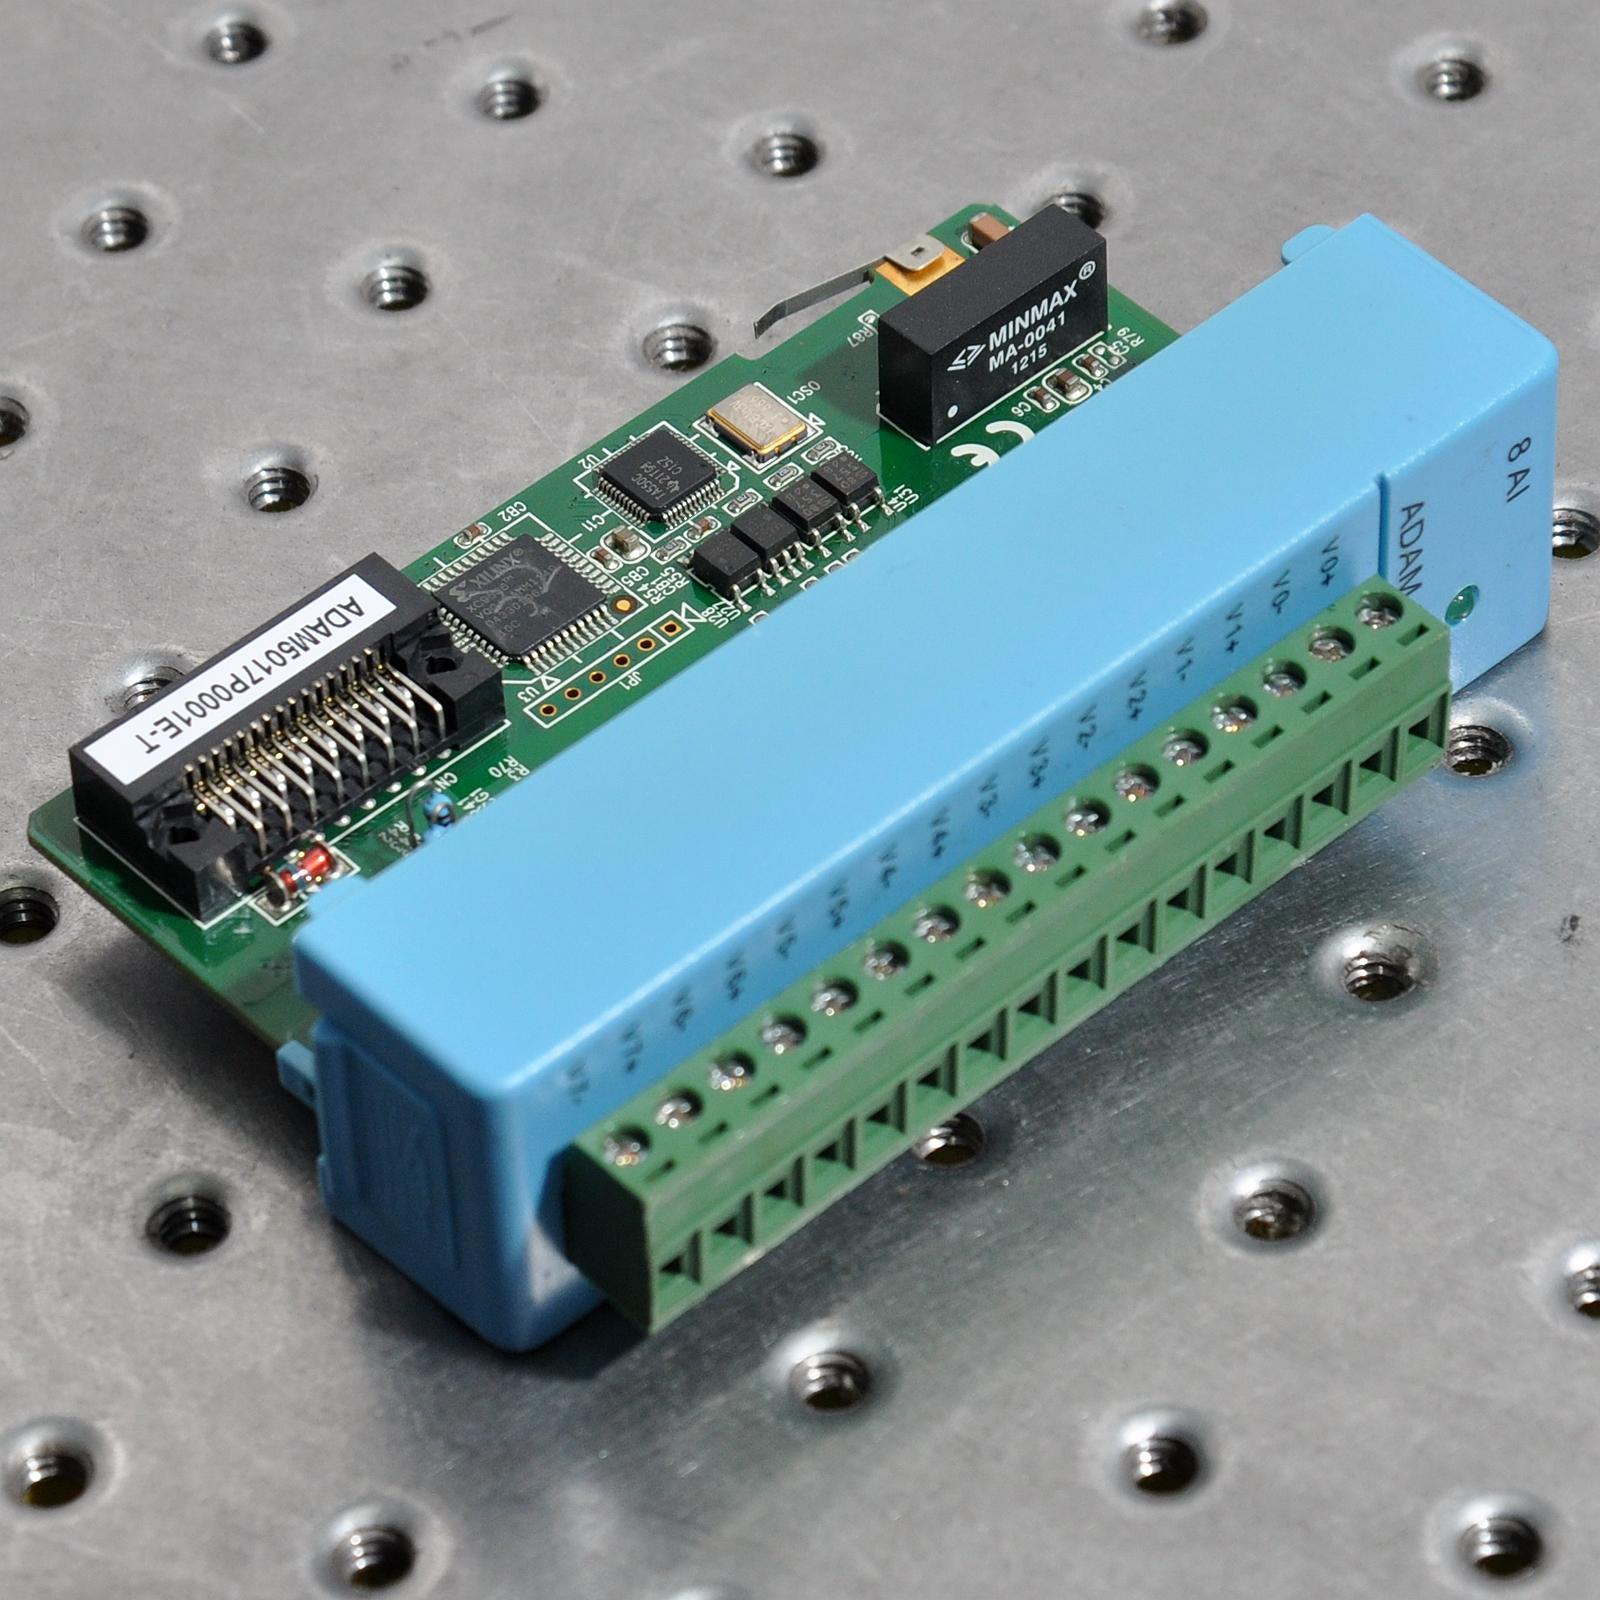 ADVANTECH ADAM-5017P 8-channel analog input module can independently configure the input range